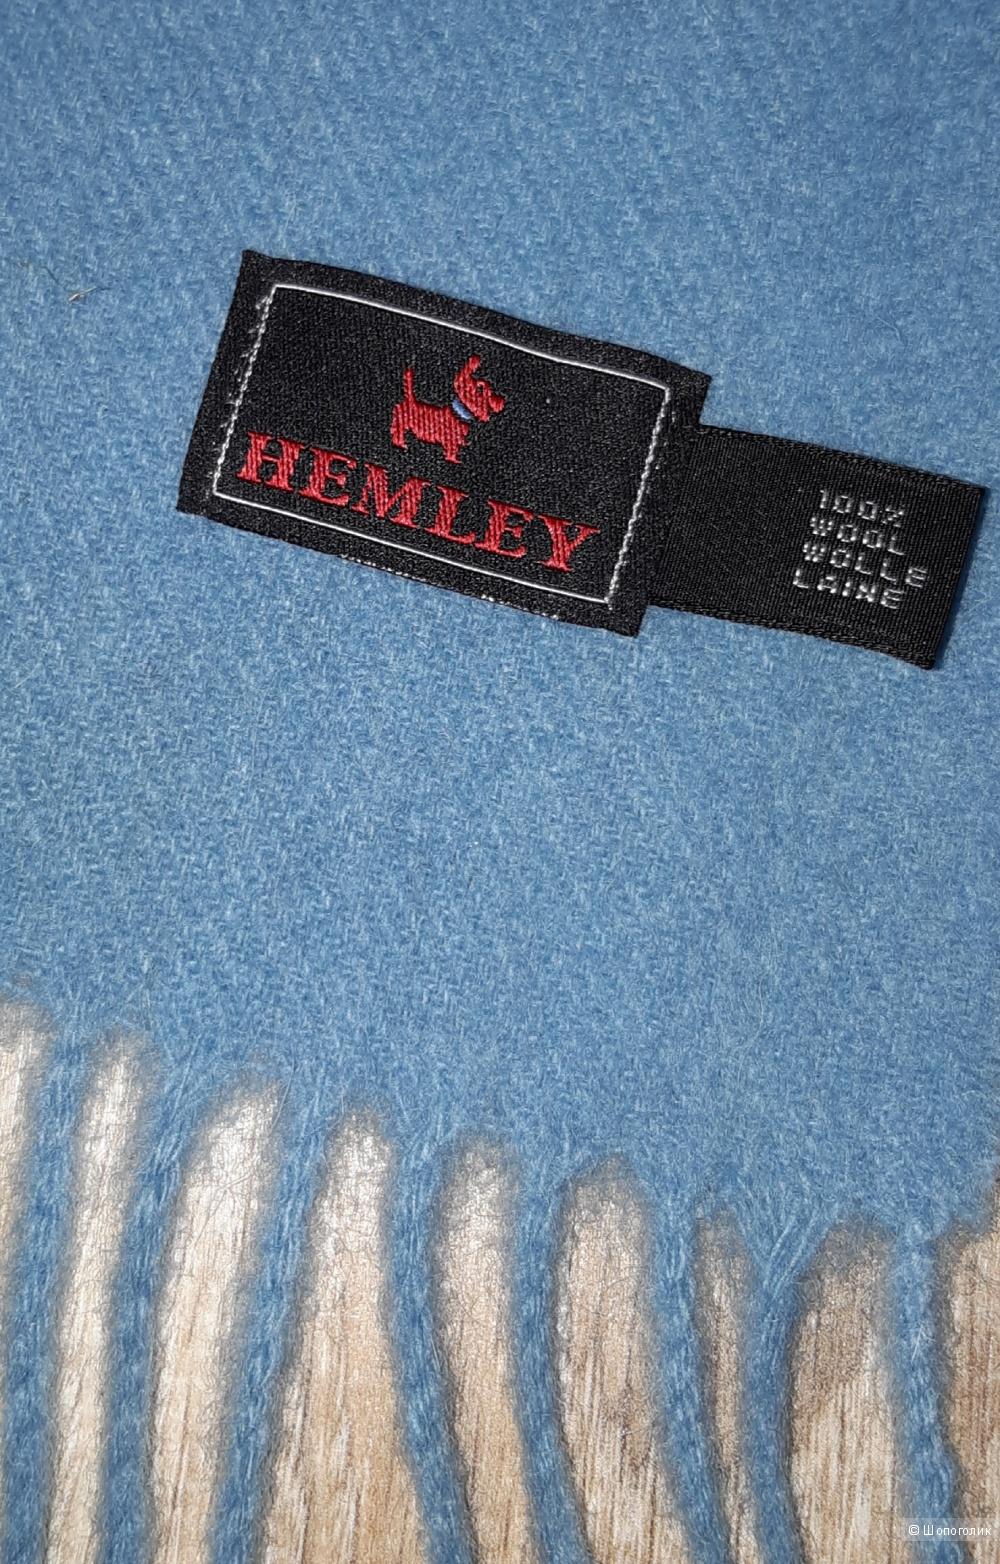 Шарф hemley, размер 30*180